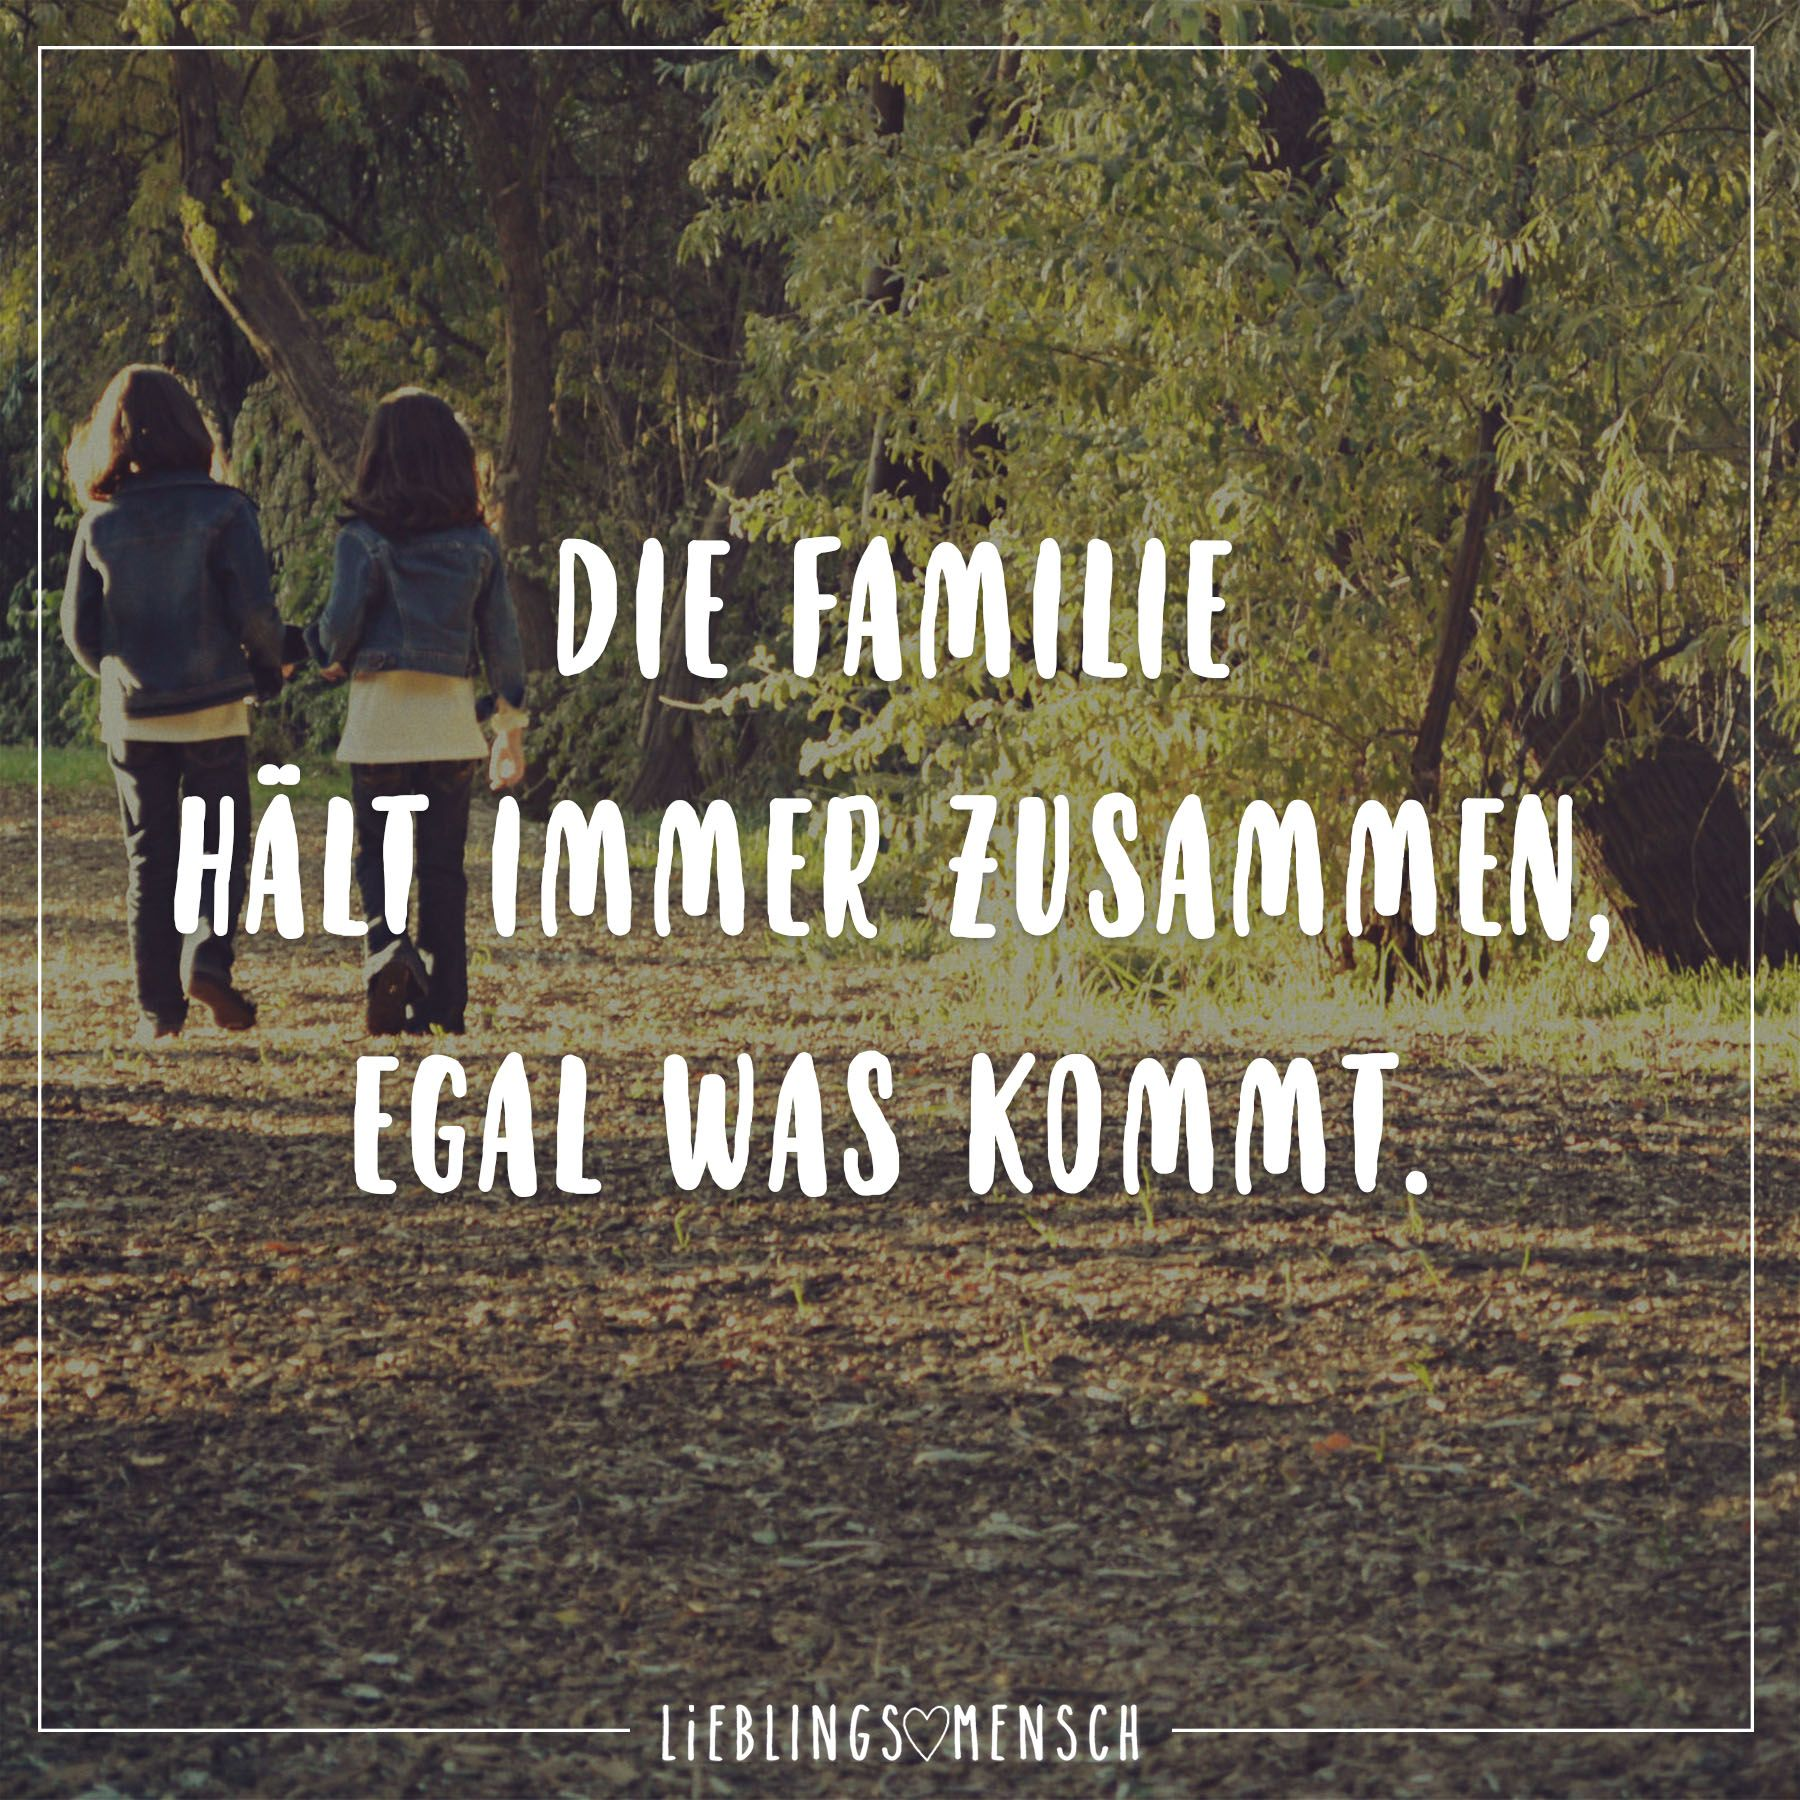 Die Familie haelt immer zusammen egal was kommt